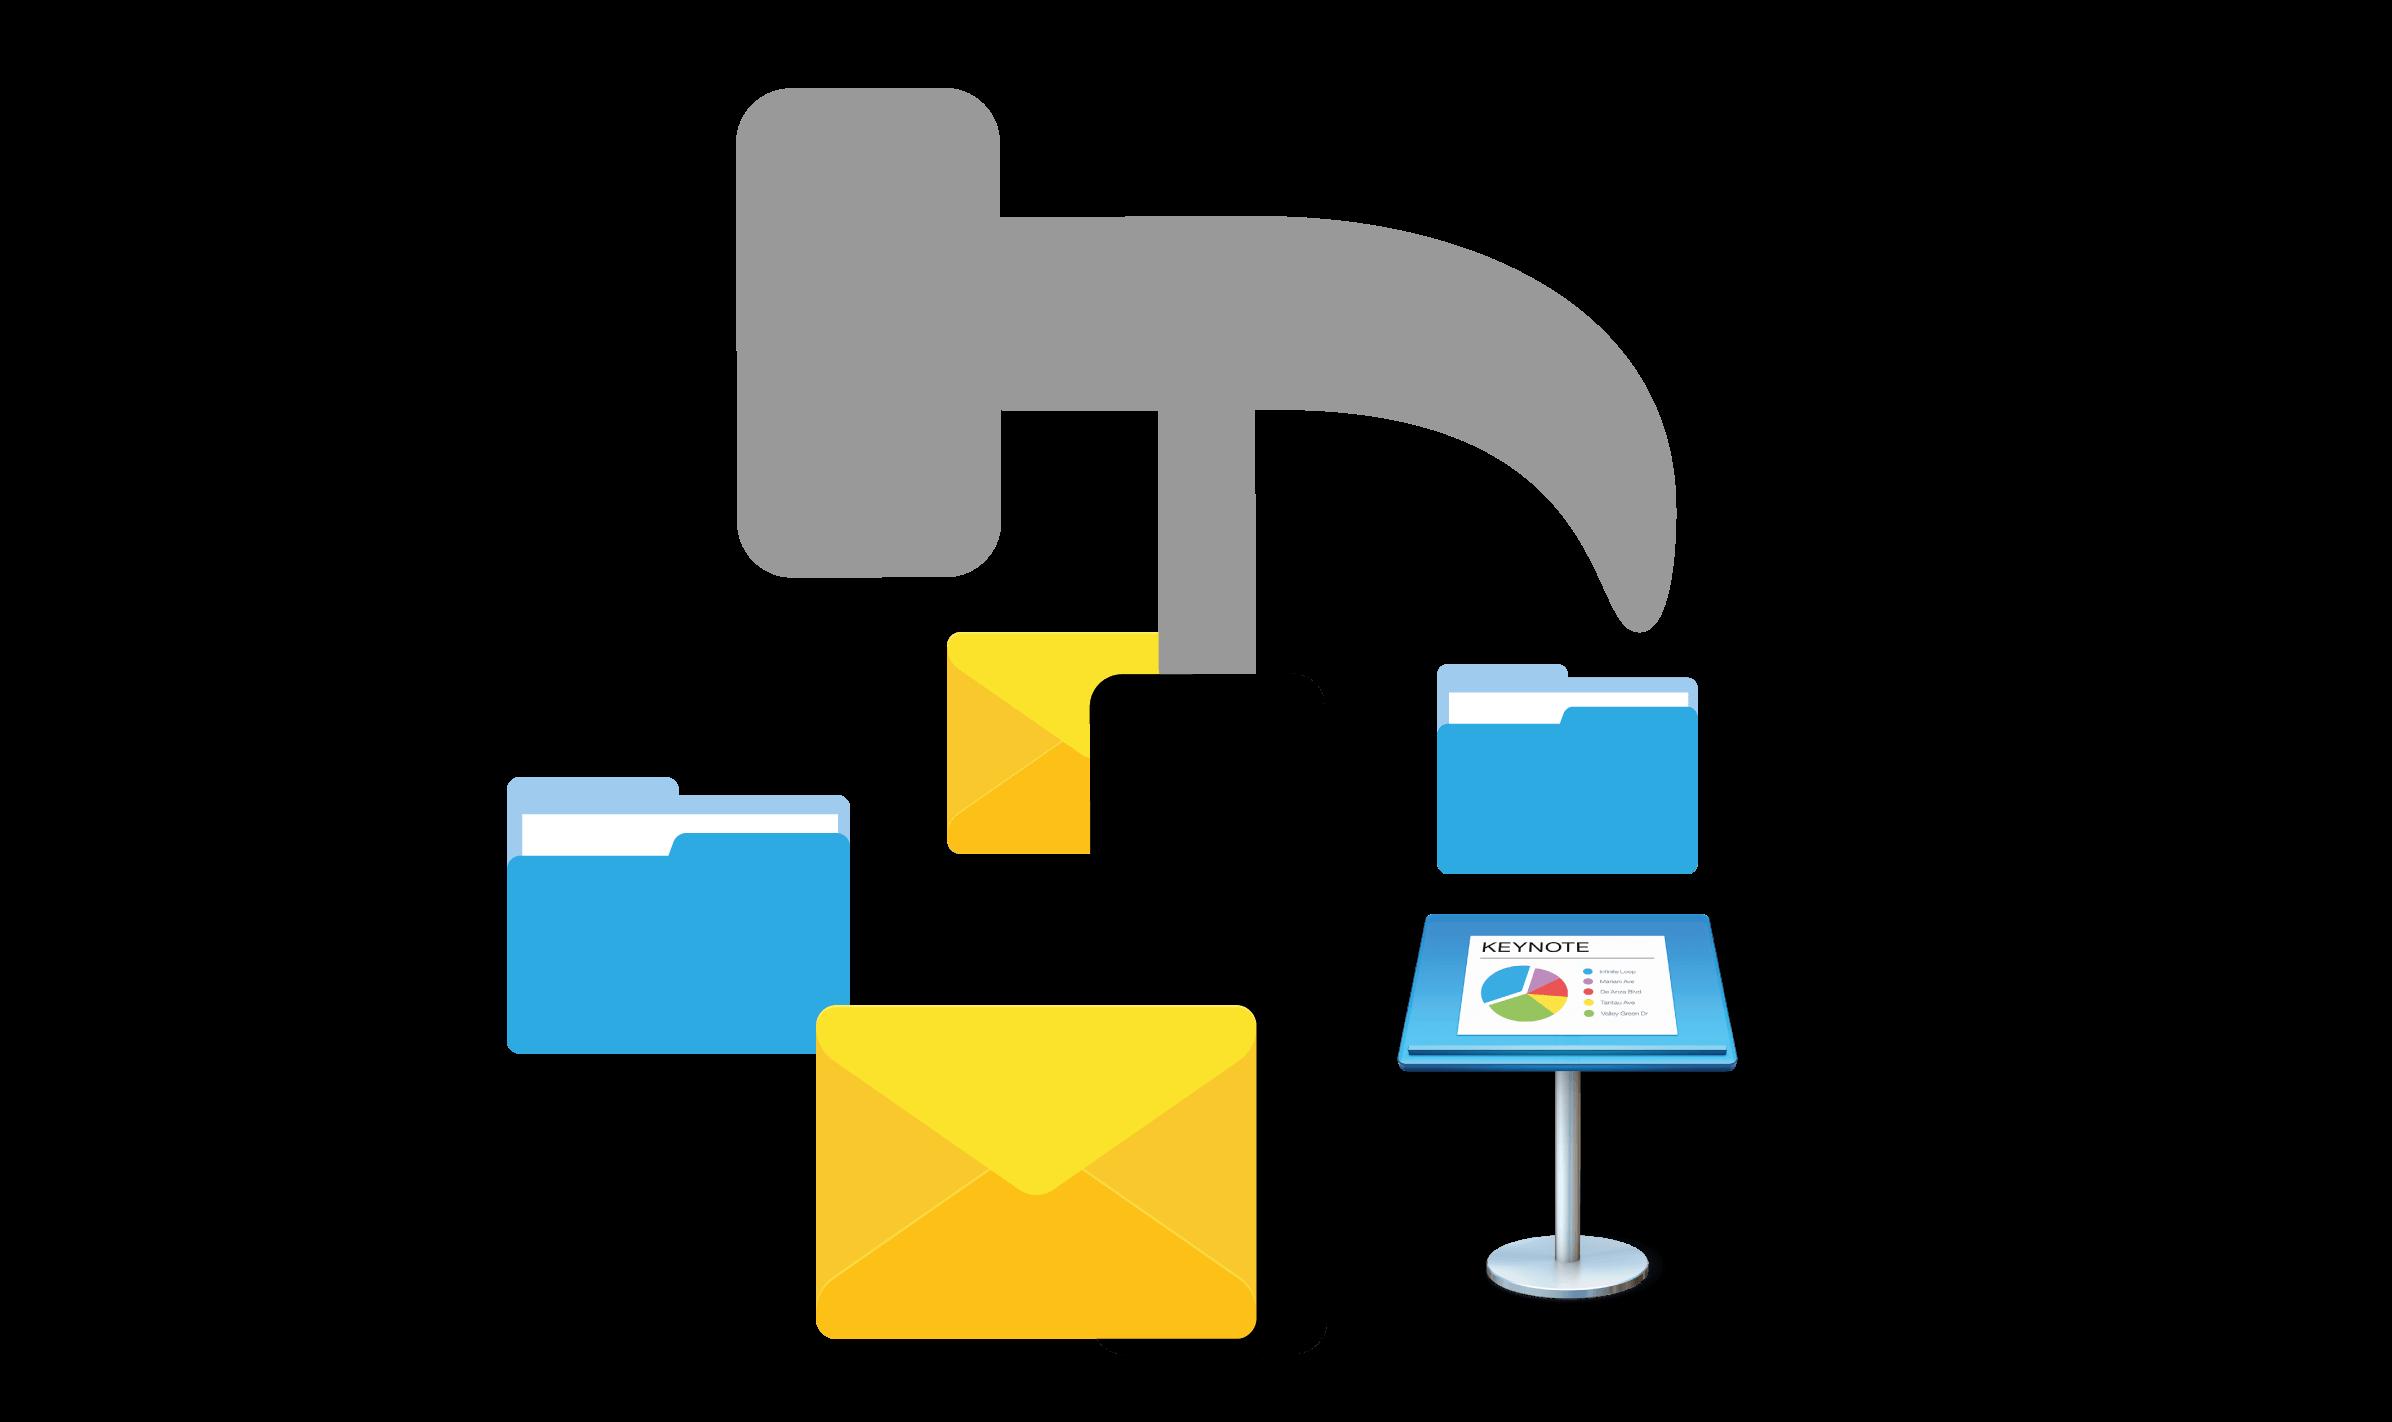 CRM Daylite Mac Projekt Kommunikation Mail.png